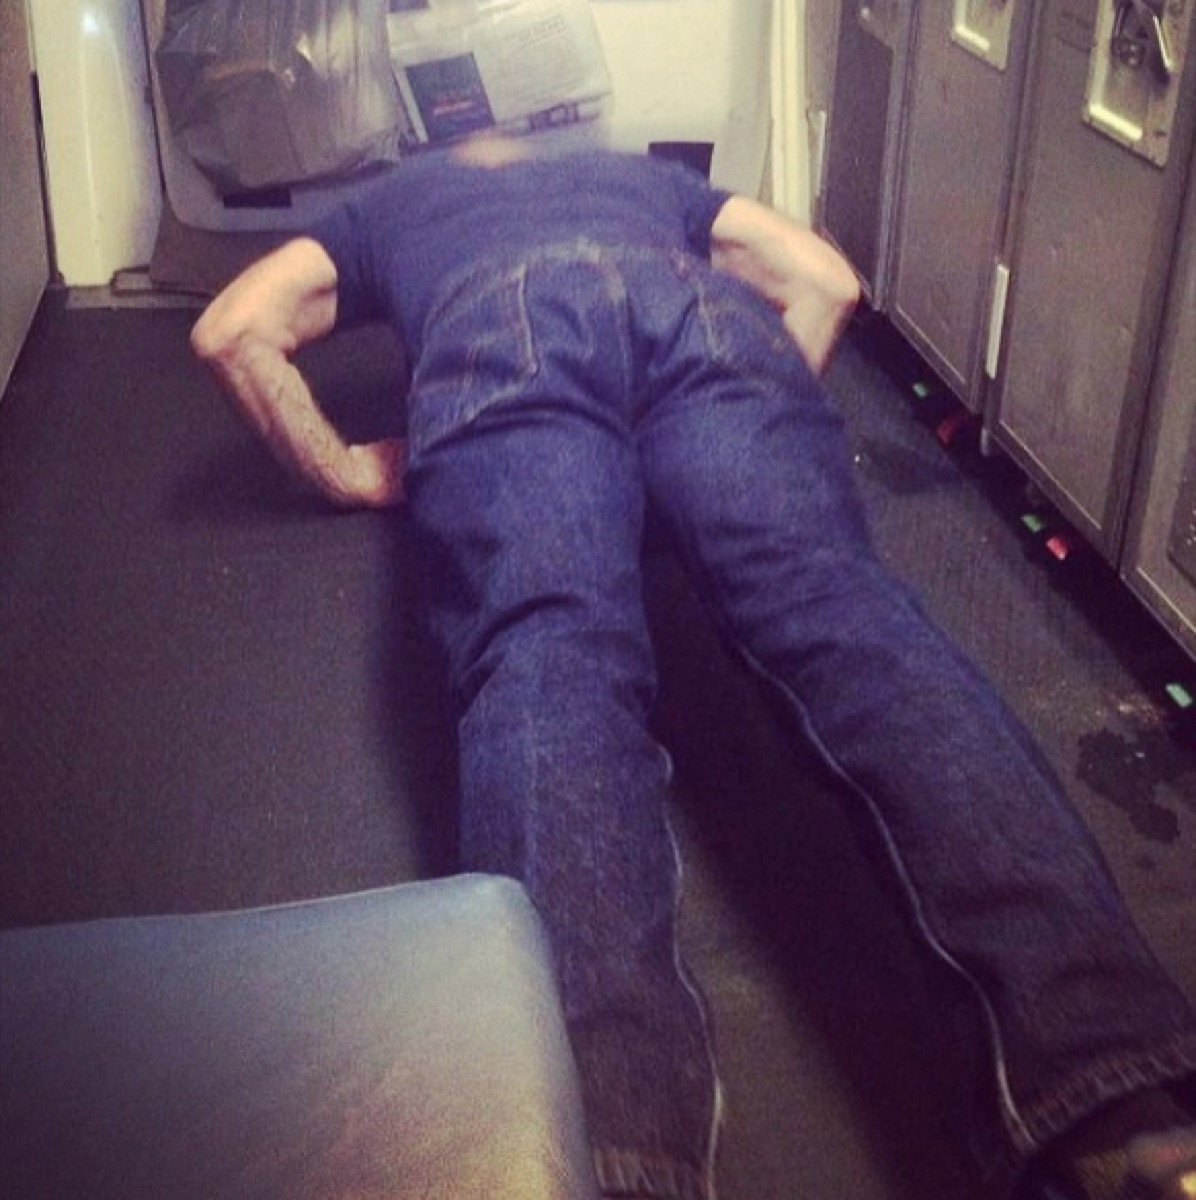 Man does pushups during flight photos of terrible airplane passengers